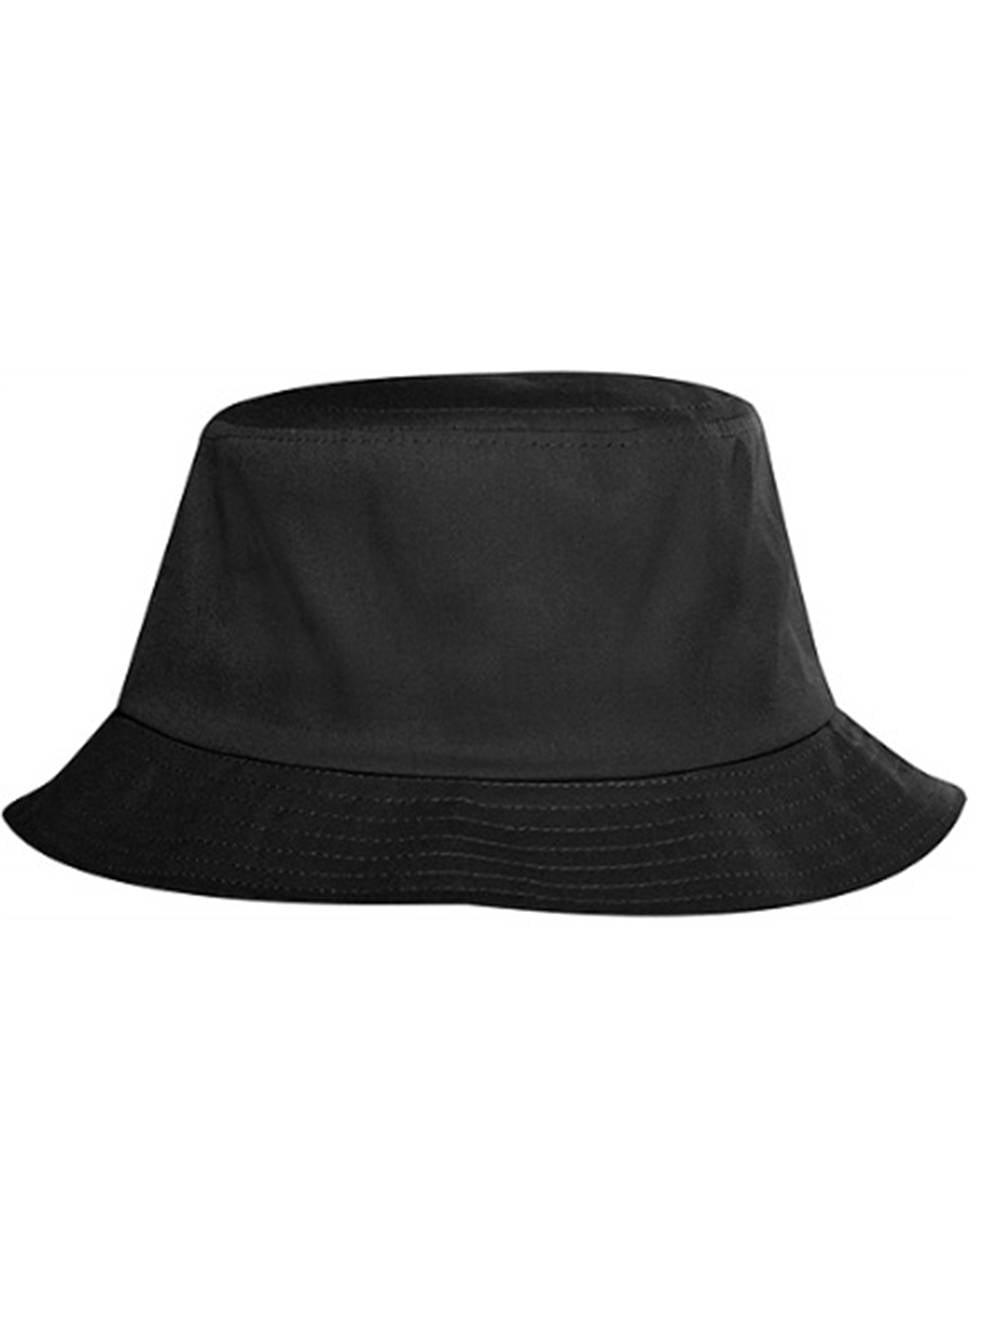 Cotton Twill Bucket Hat - Black Medium 9cc52ecbddd